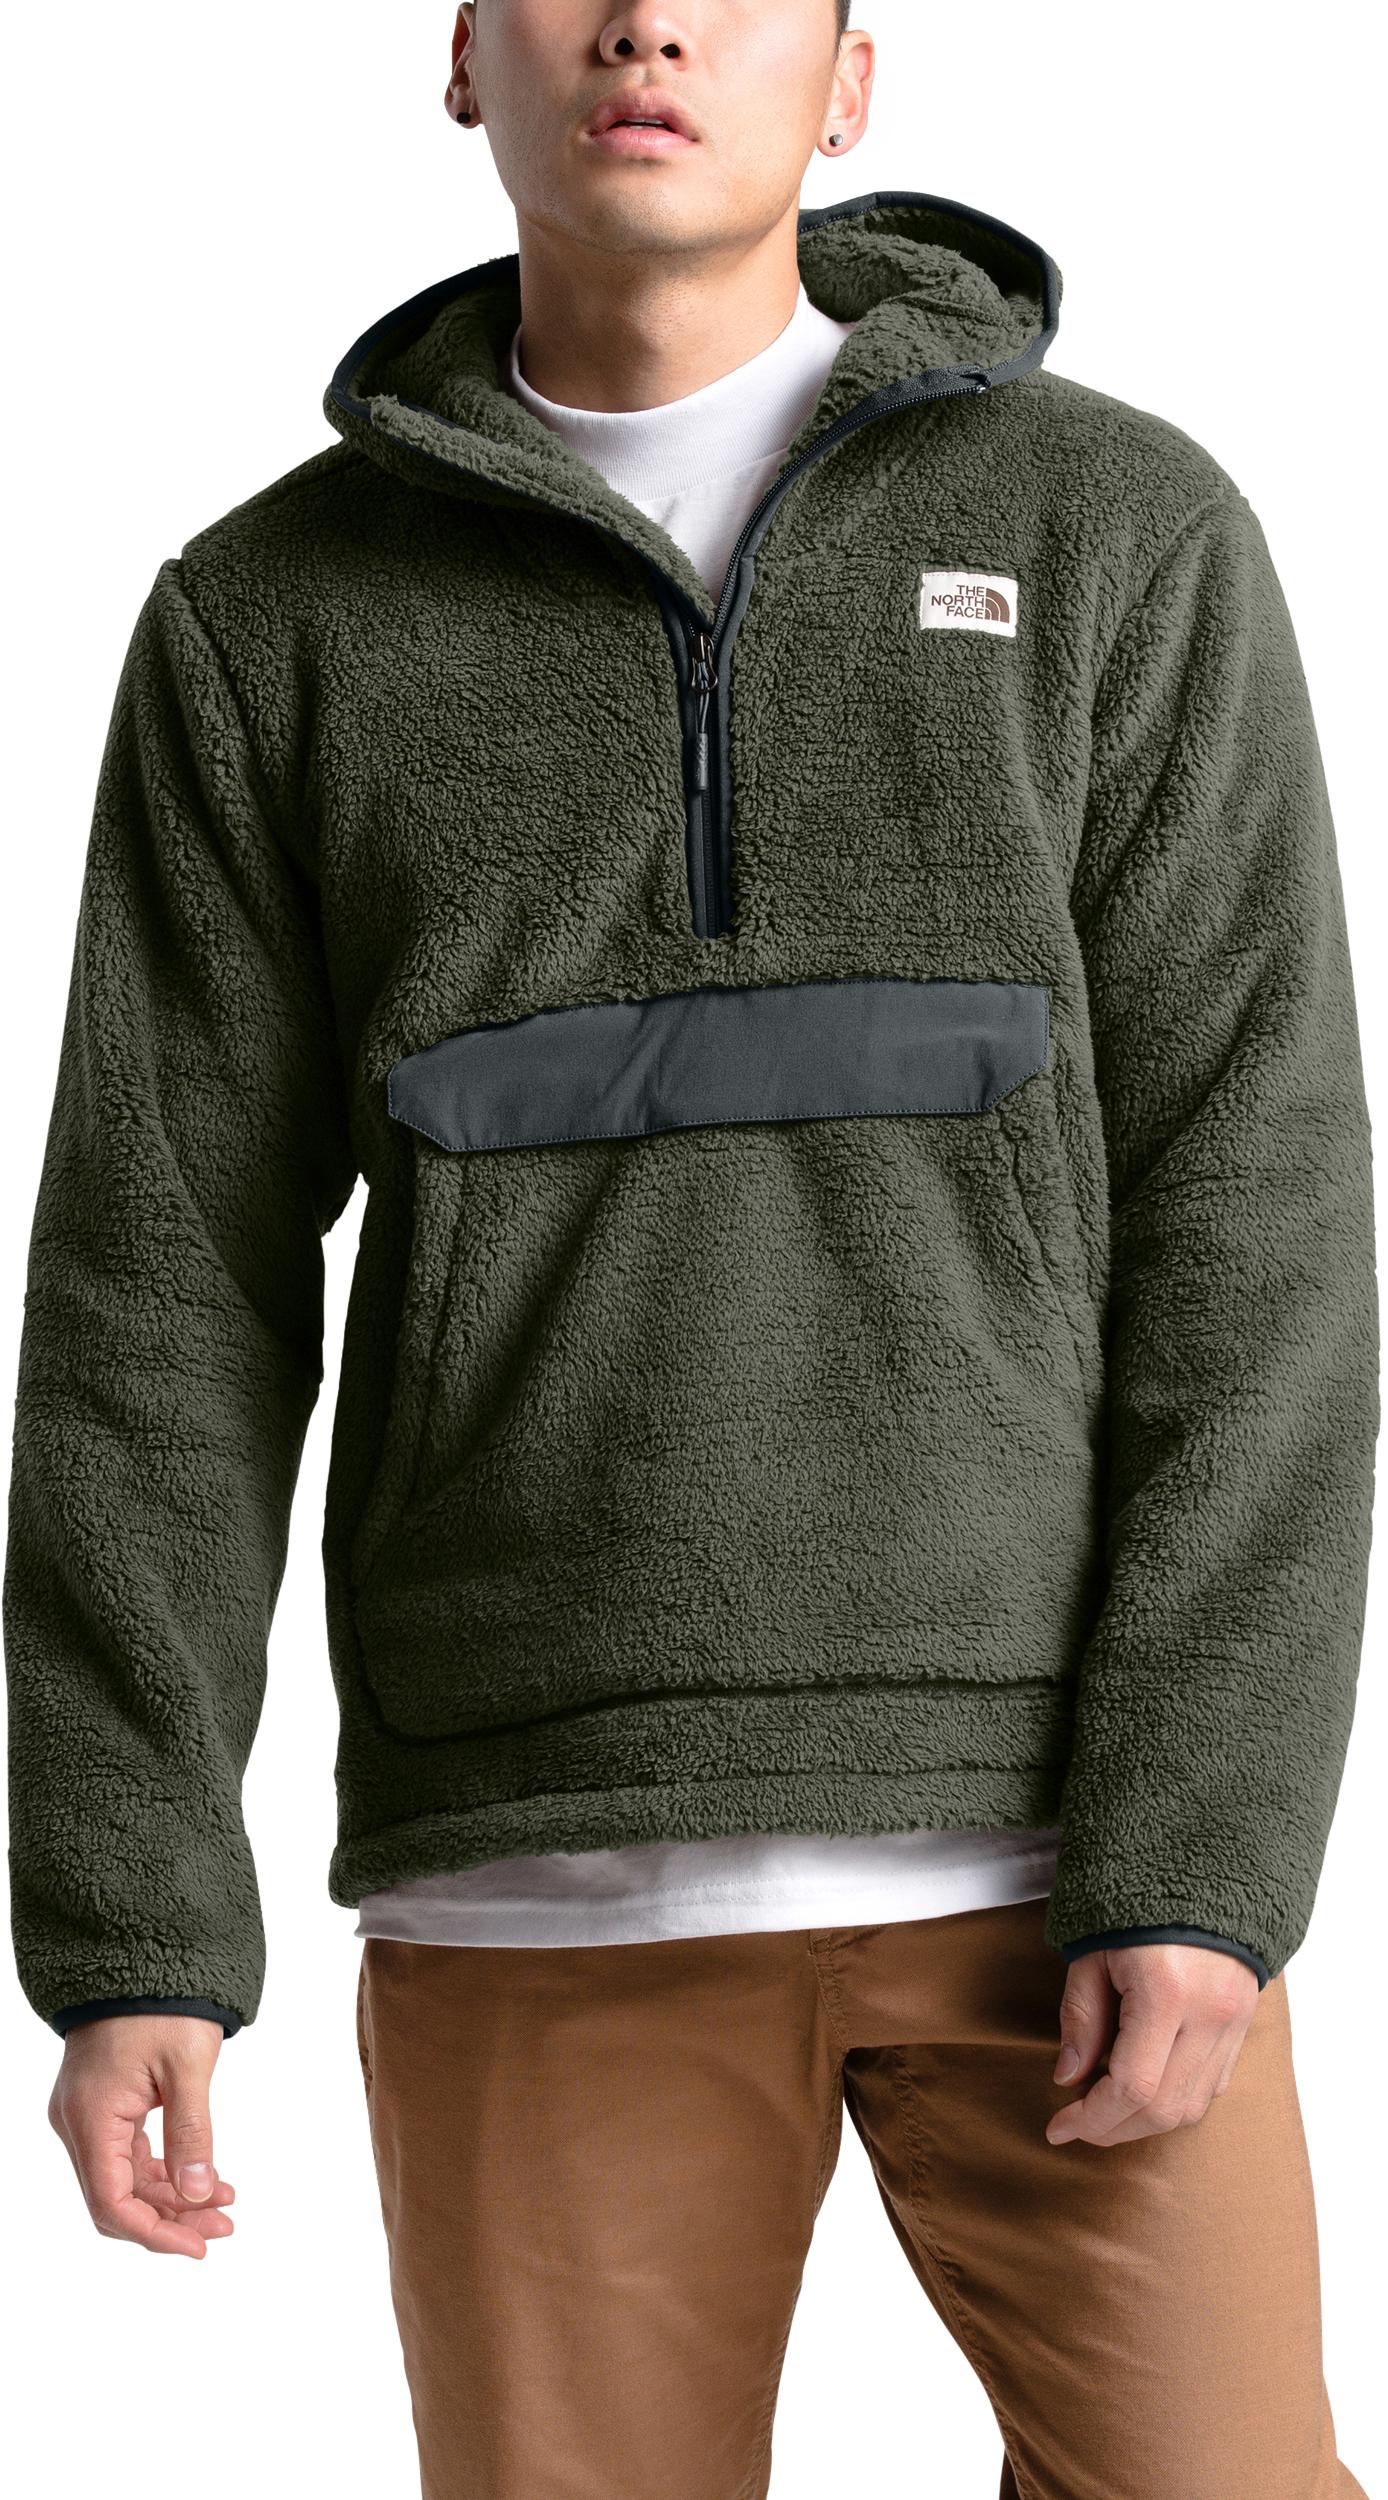 d938d8a86 Fleece jackets | MEC